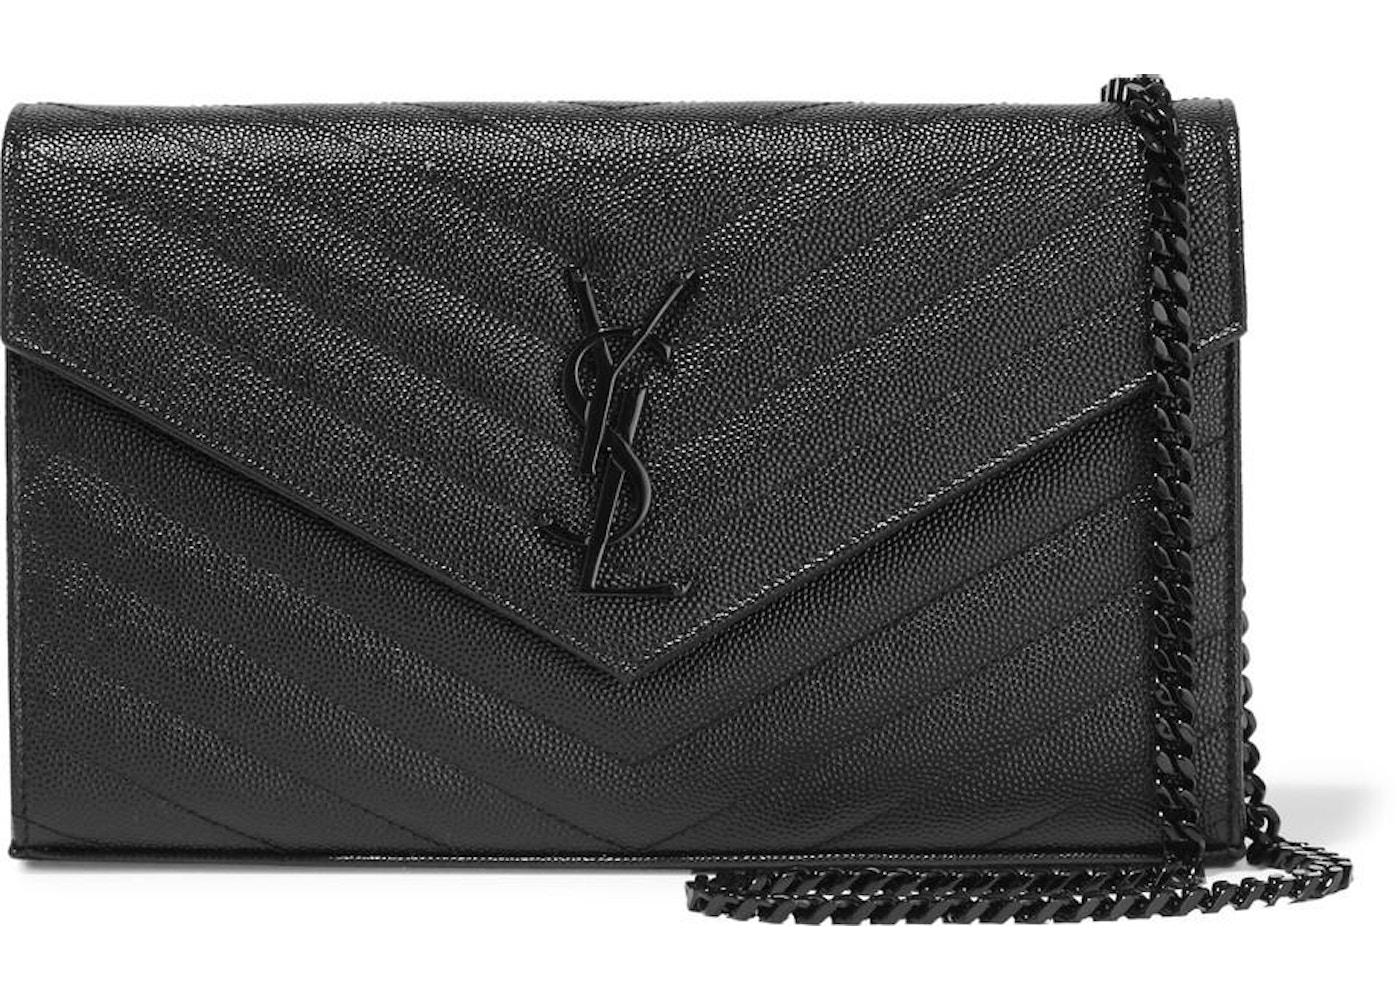 663c0230e02ee Buy & Sell Saint Laurent Luxury Handbags